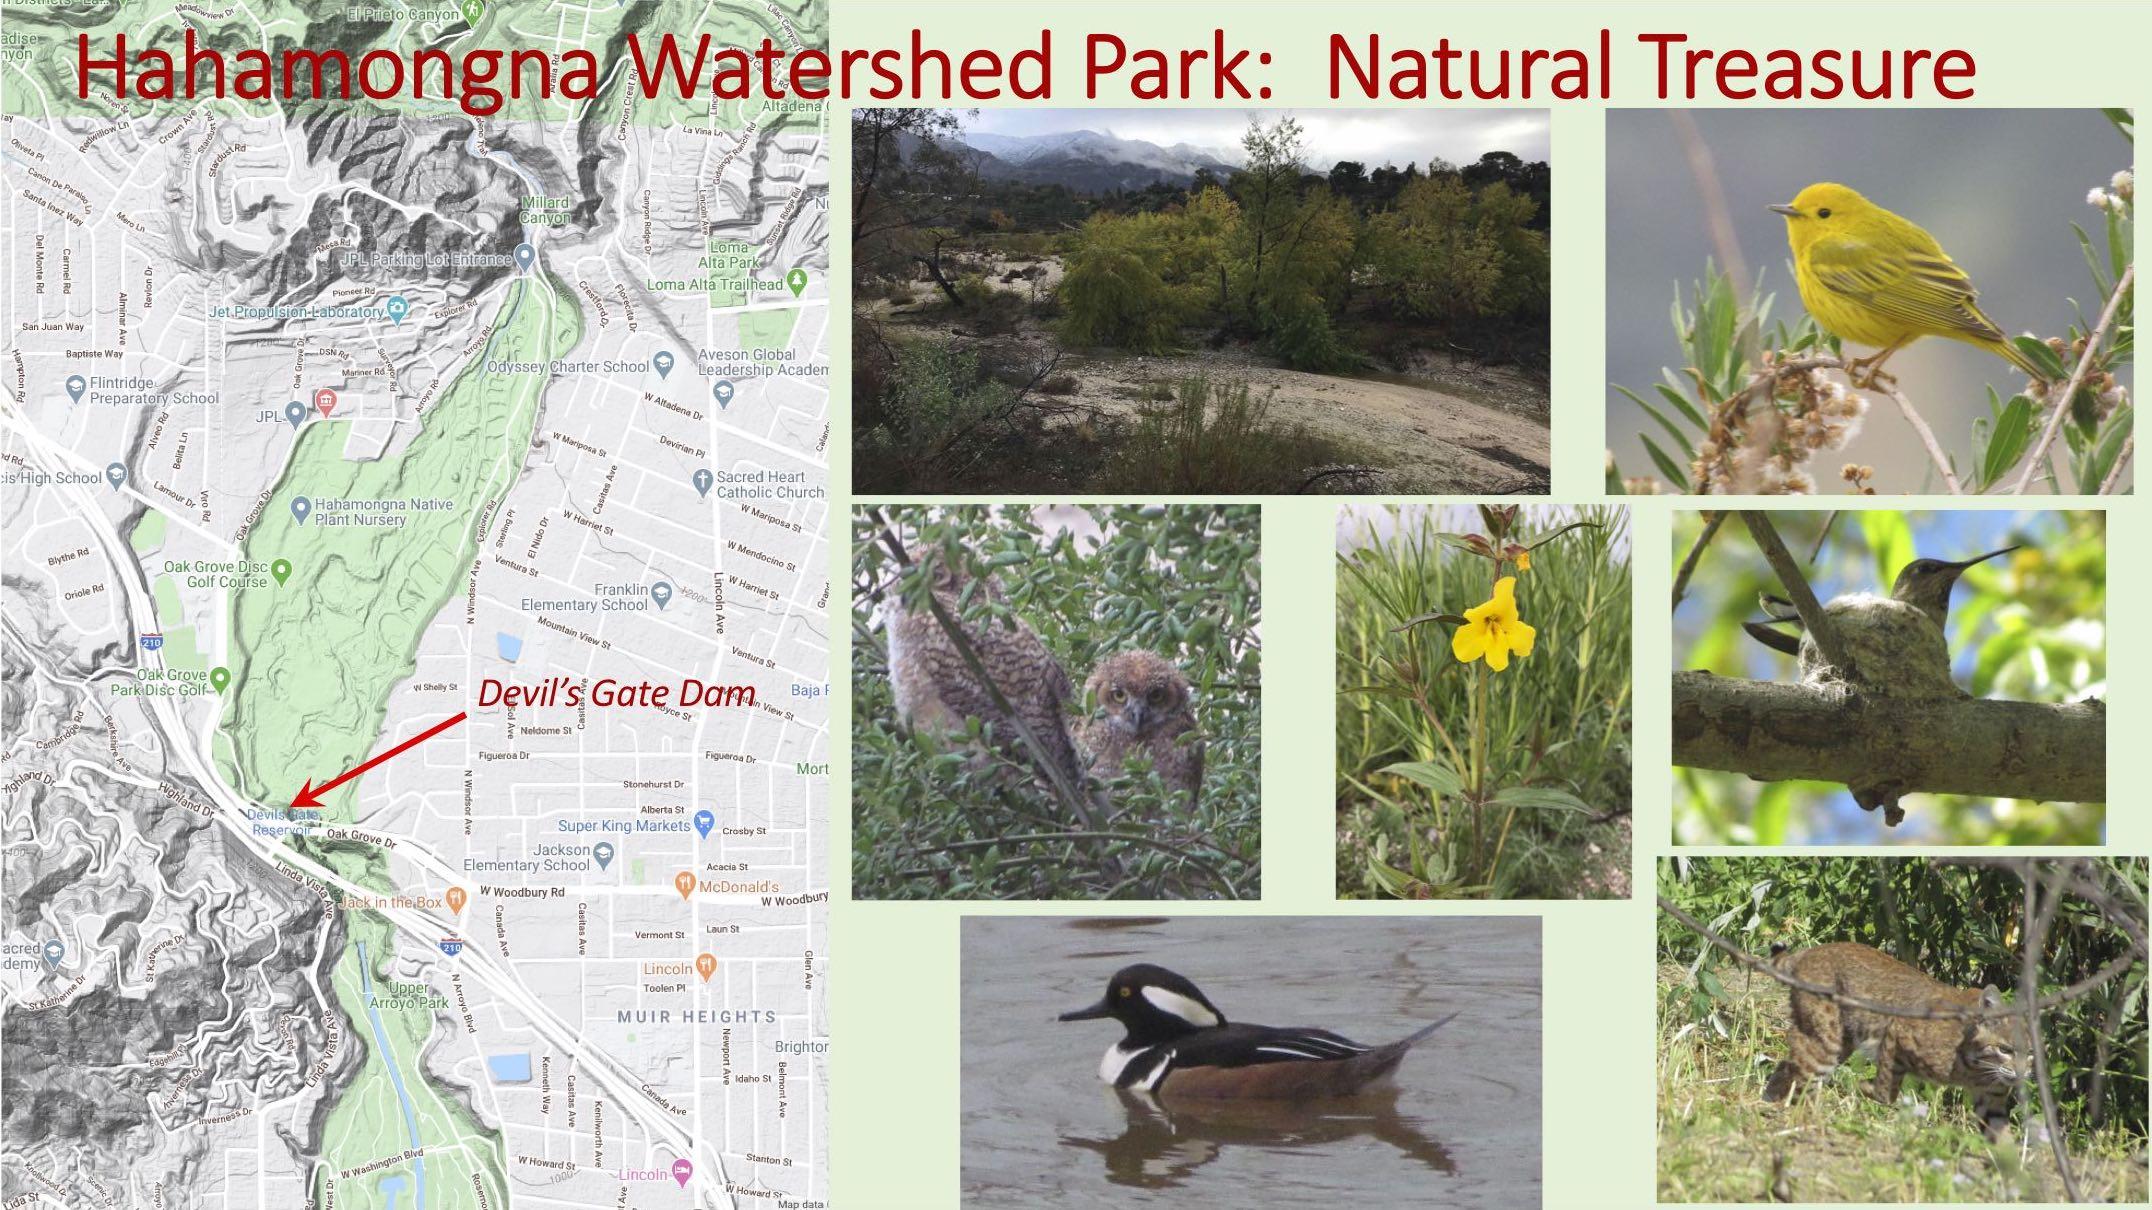 Hahamonga Watershed Park: A national treasure